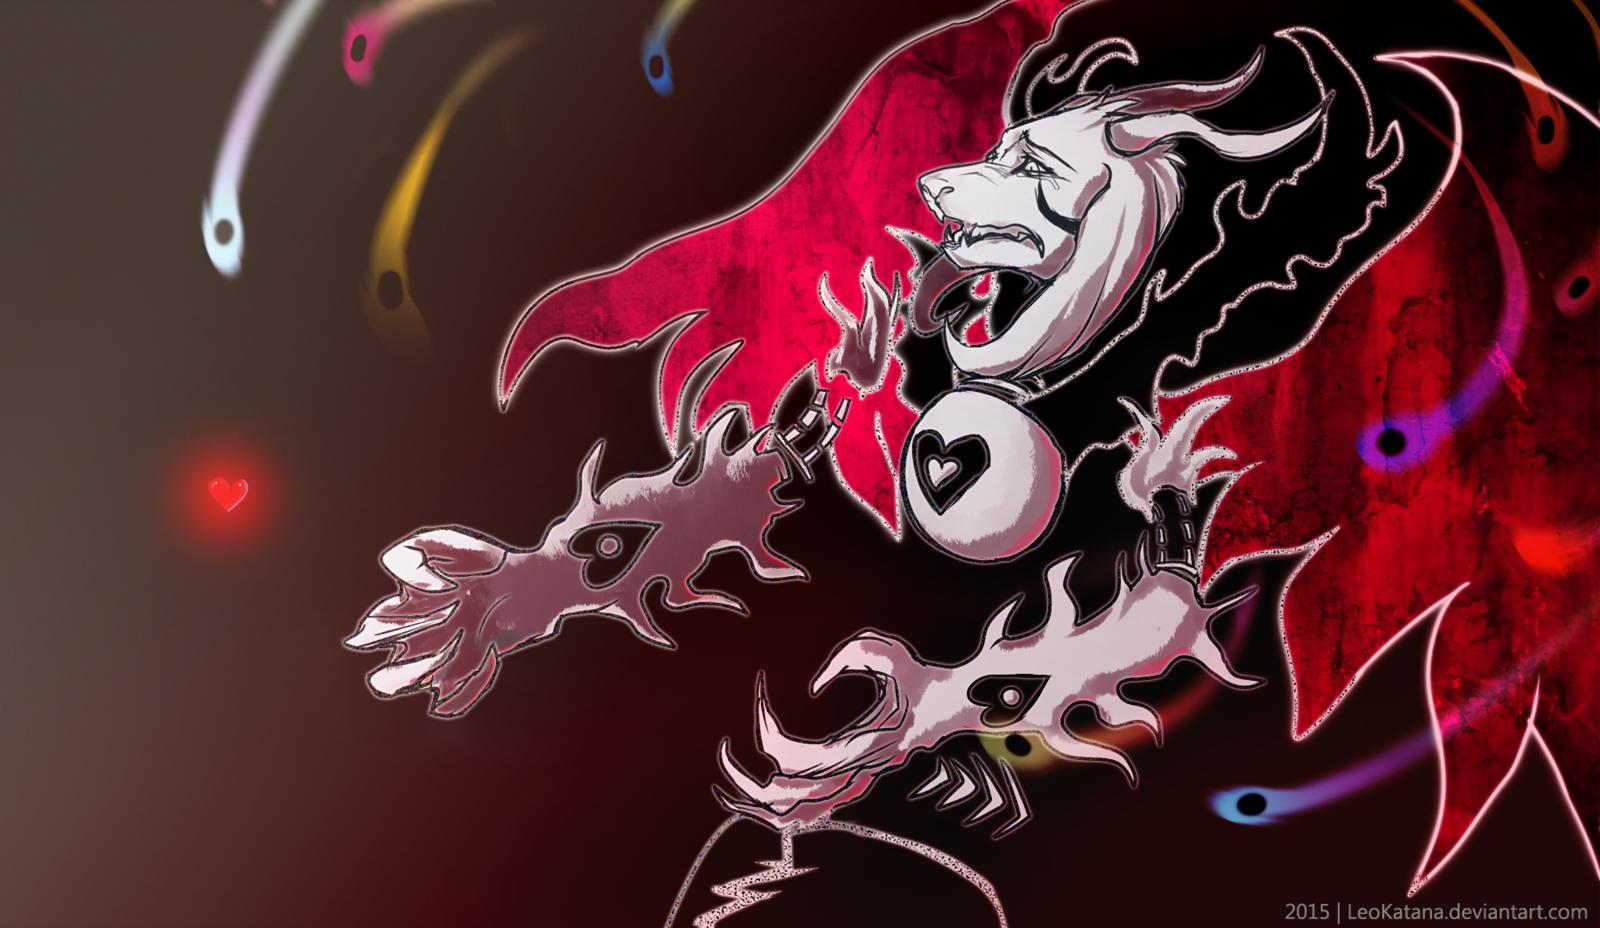 Undertale Asriel Dreemurr Demon mode by LeoKatana 1600x928